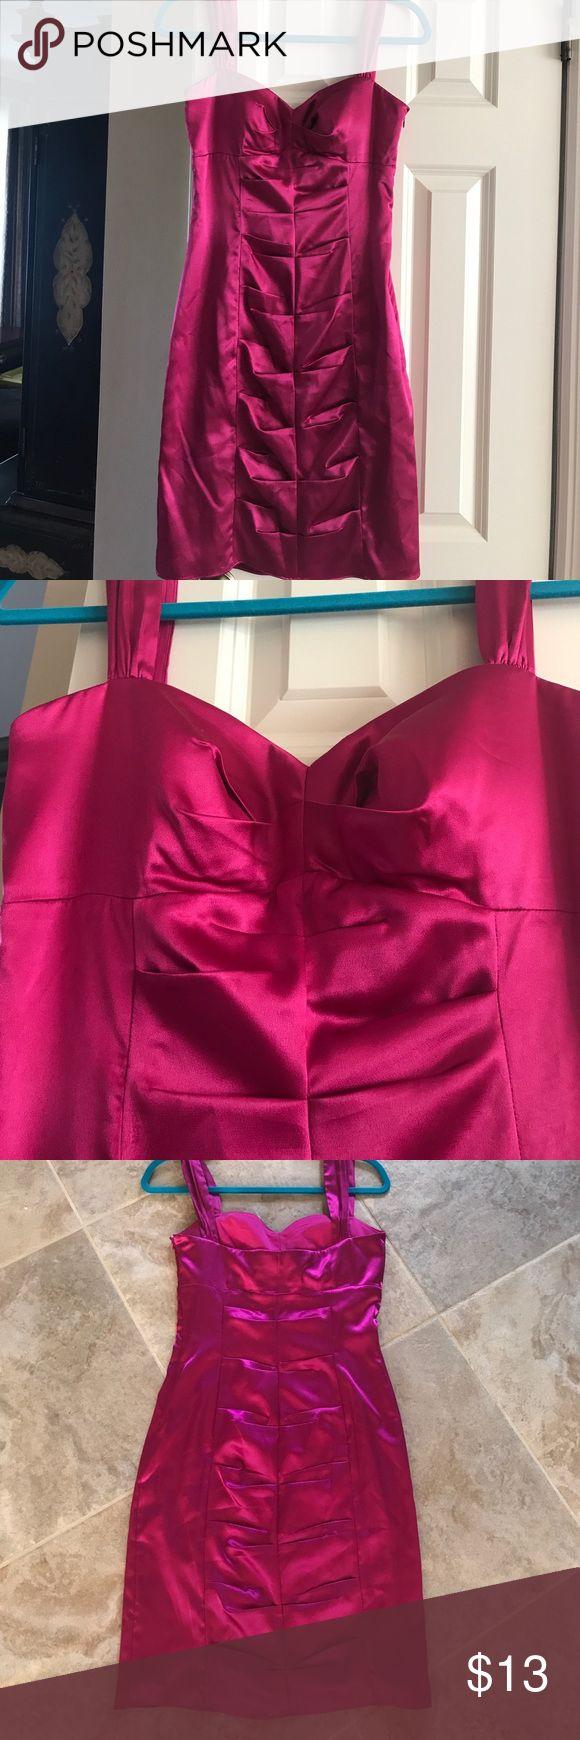 Fushia dress! Size 9/10 juniors. Worn once. Like new. Size 9/10. Zips up side. 95% polyester 5% spandex. Morgan & Co. Dresses